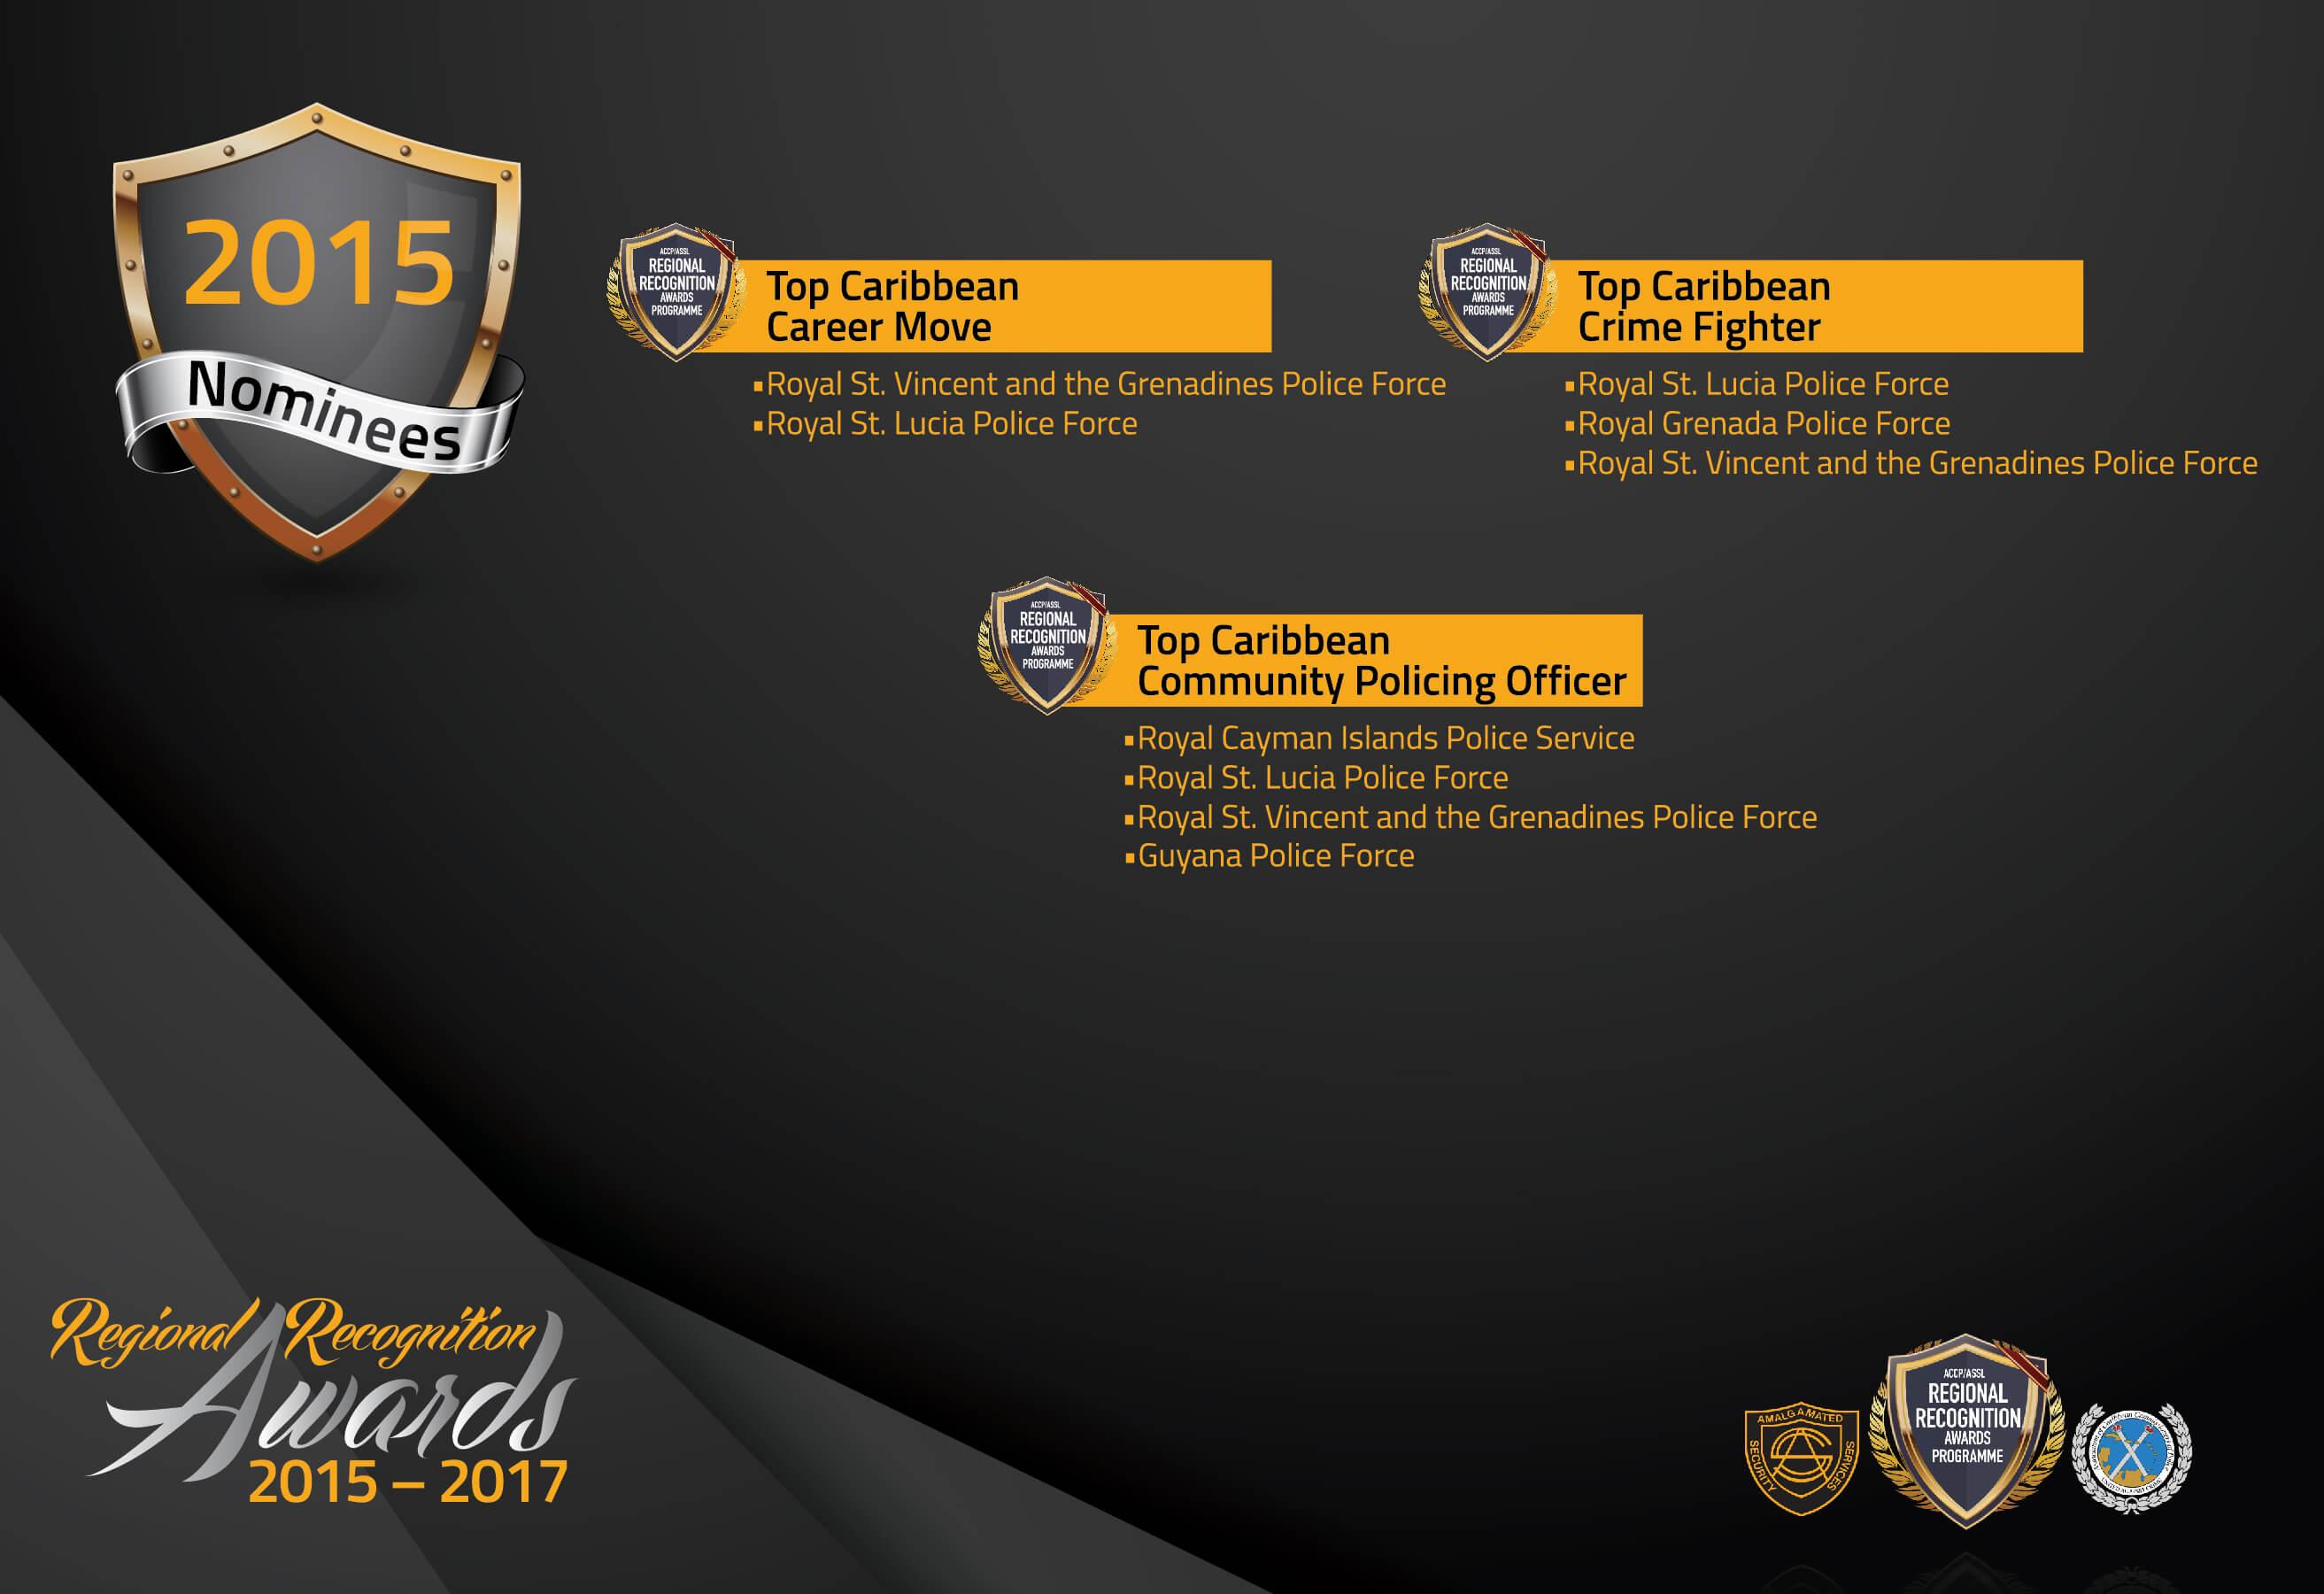 2015 Nominees